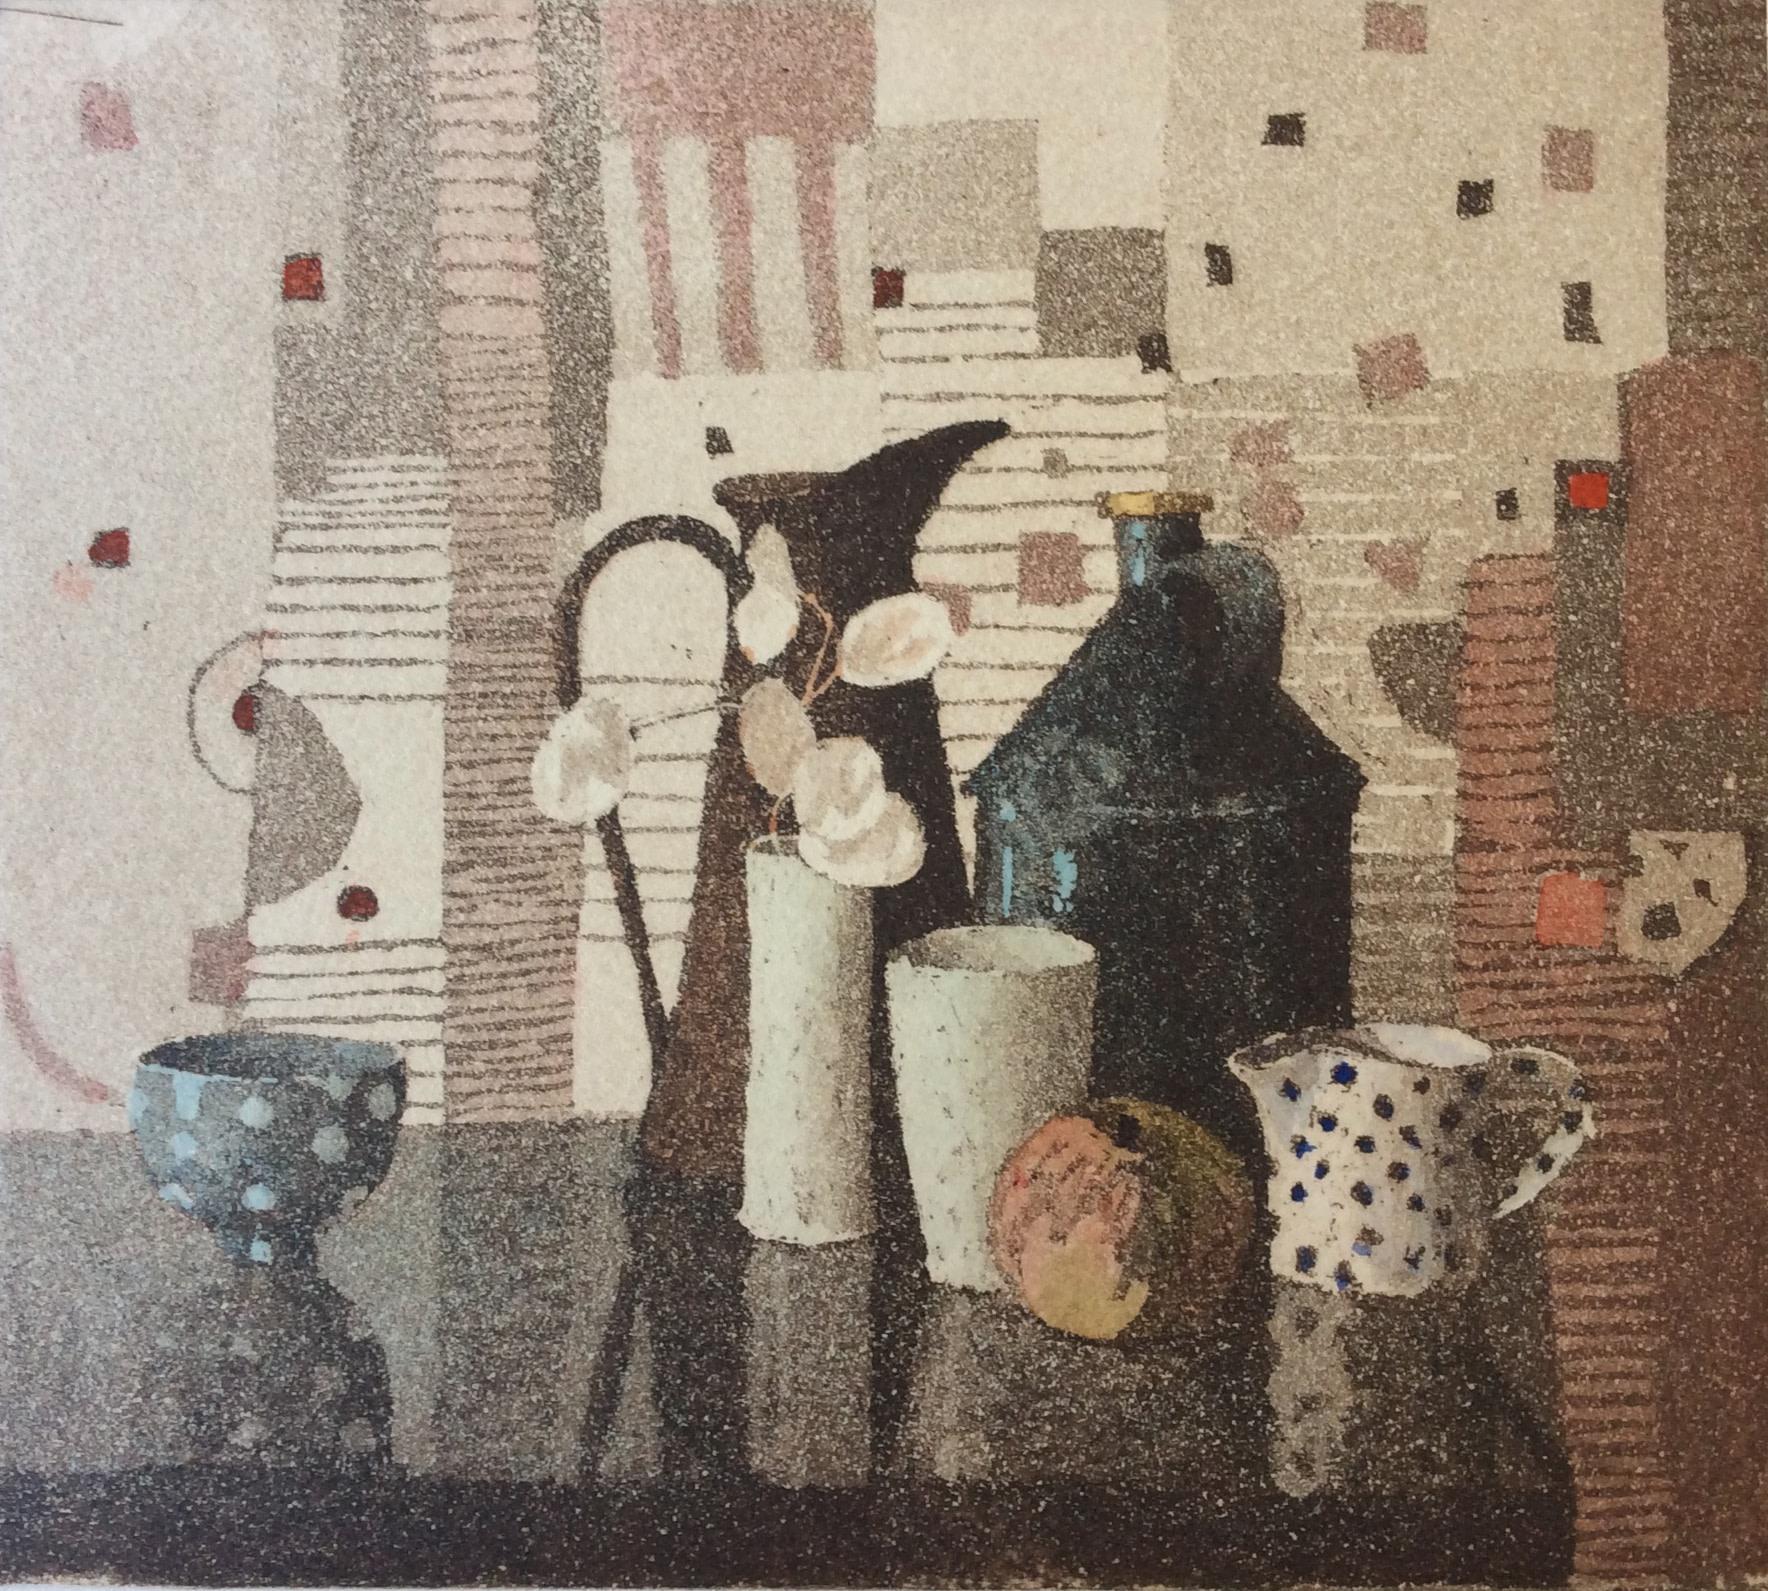 "<span class=""link fancybox-details-link""><a href=""/artists/131-annie-williams-rws-re/works/11512/"">View Detail Page</a></span><div class=""artist""><span class=""artist""><strong>Annie Williams RWS RE</strong></span></div><div class=""title""><em>Horsley Still Life</em></div><div class=""medium"">etching & wash</div><div class=""dimensions"">36 x 36cm framed size<br /> 15 x 16cm image size</div><div class=""edition_details"">edition of 40</div><div class=""price"">£170.00 framed<br>£120.00 unframed</div>"